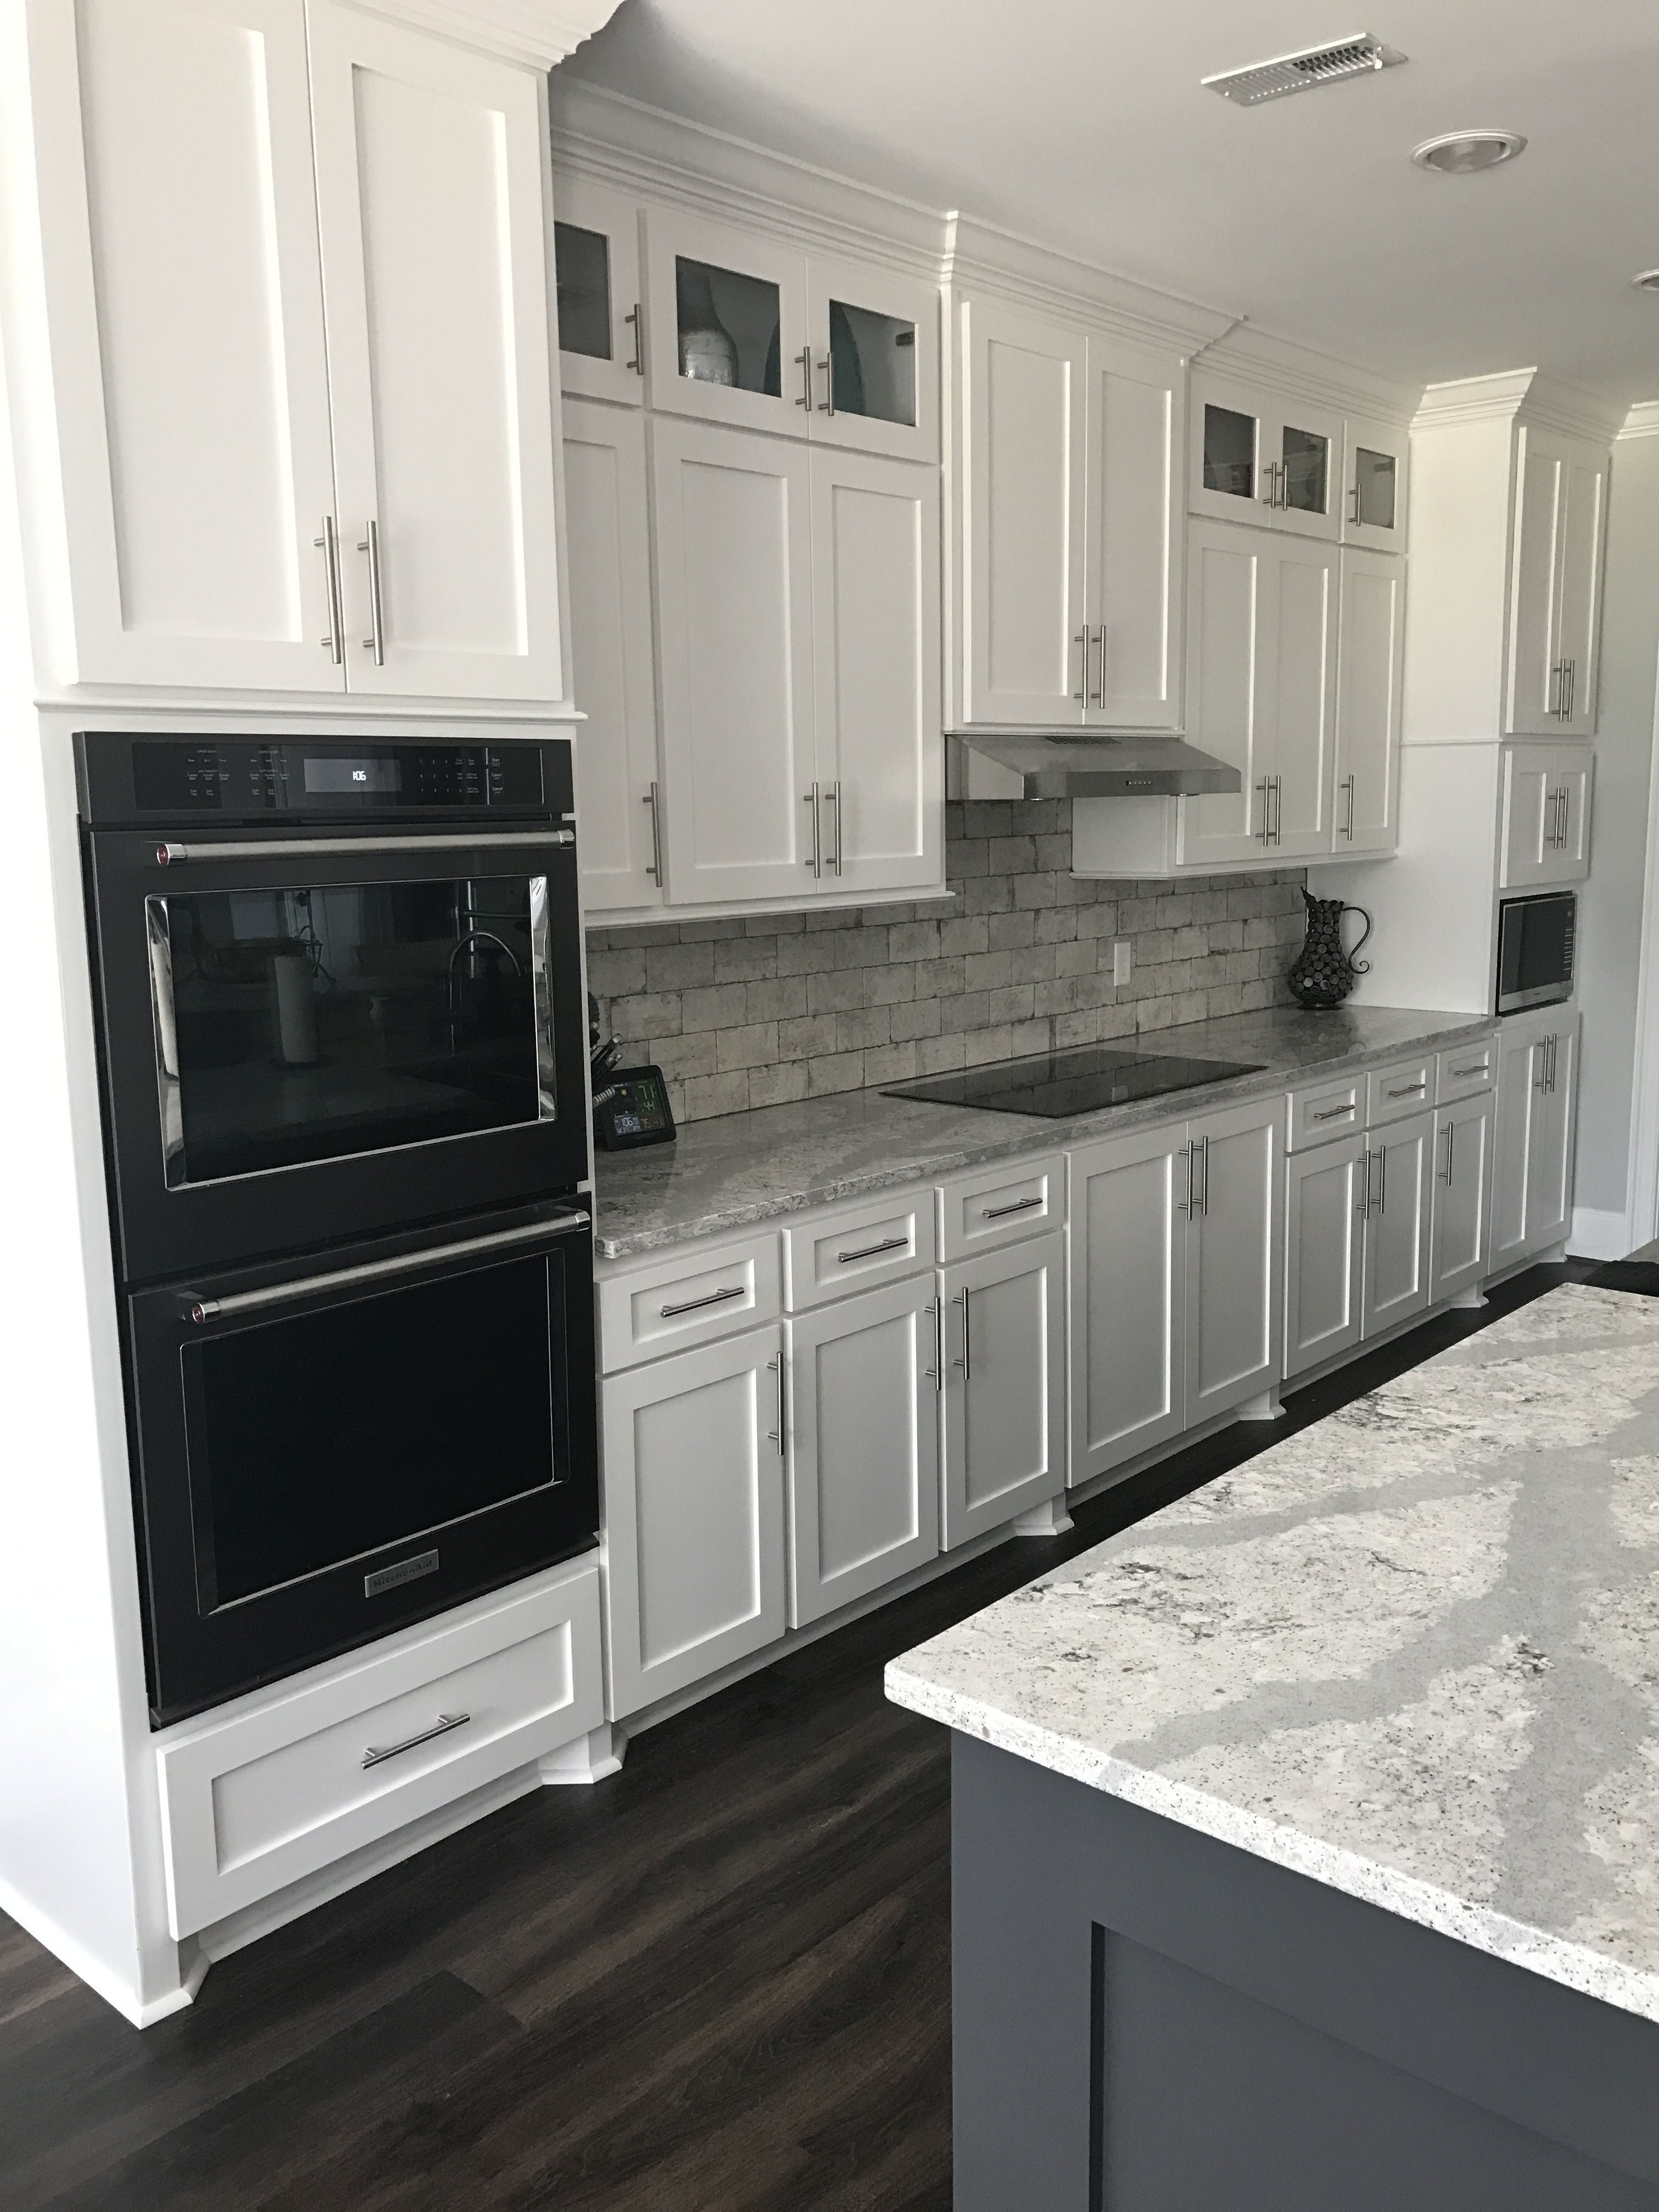 black stainless kitchenaid appliances white cabinets   craftsman